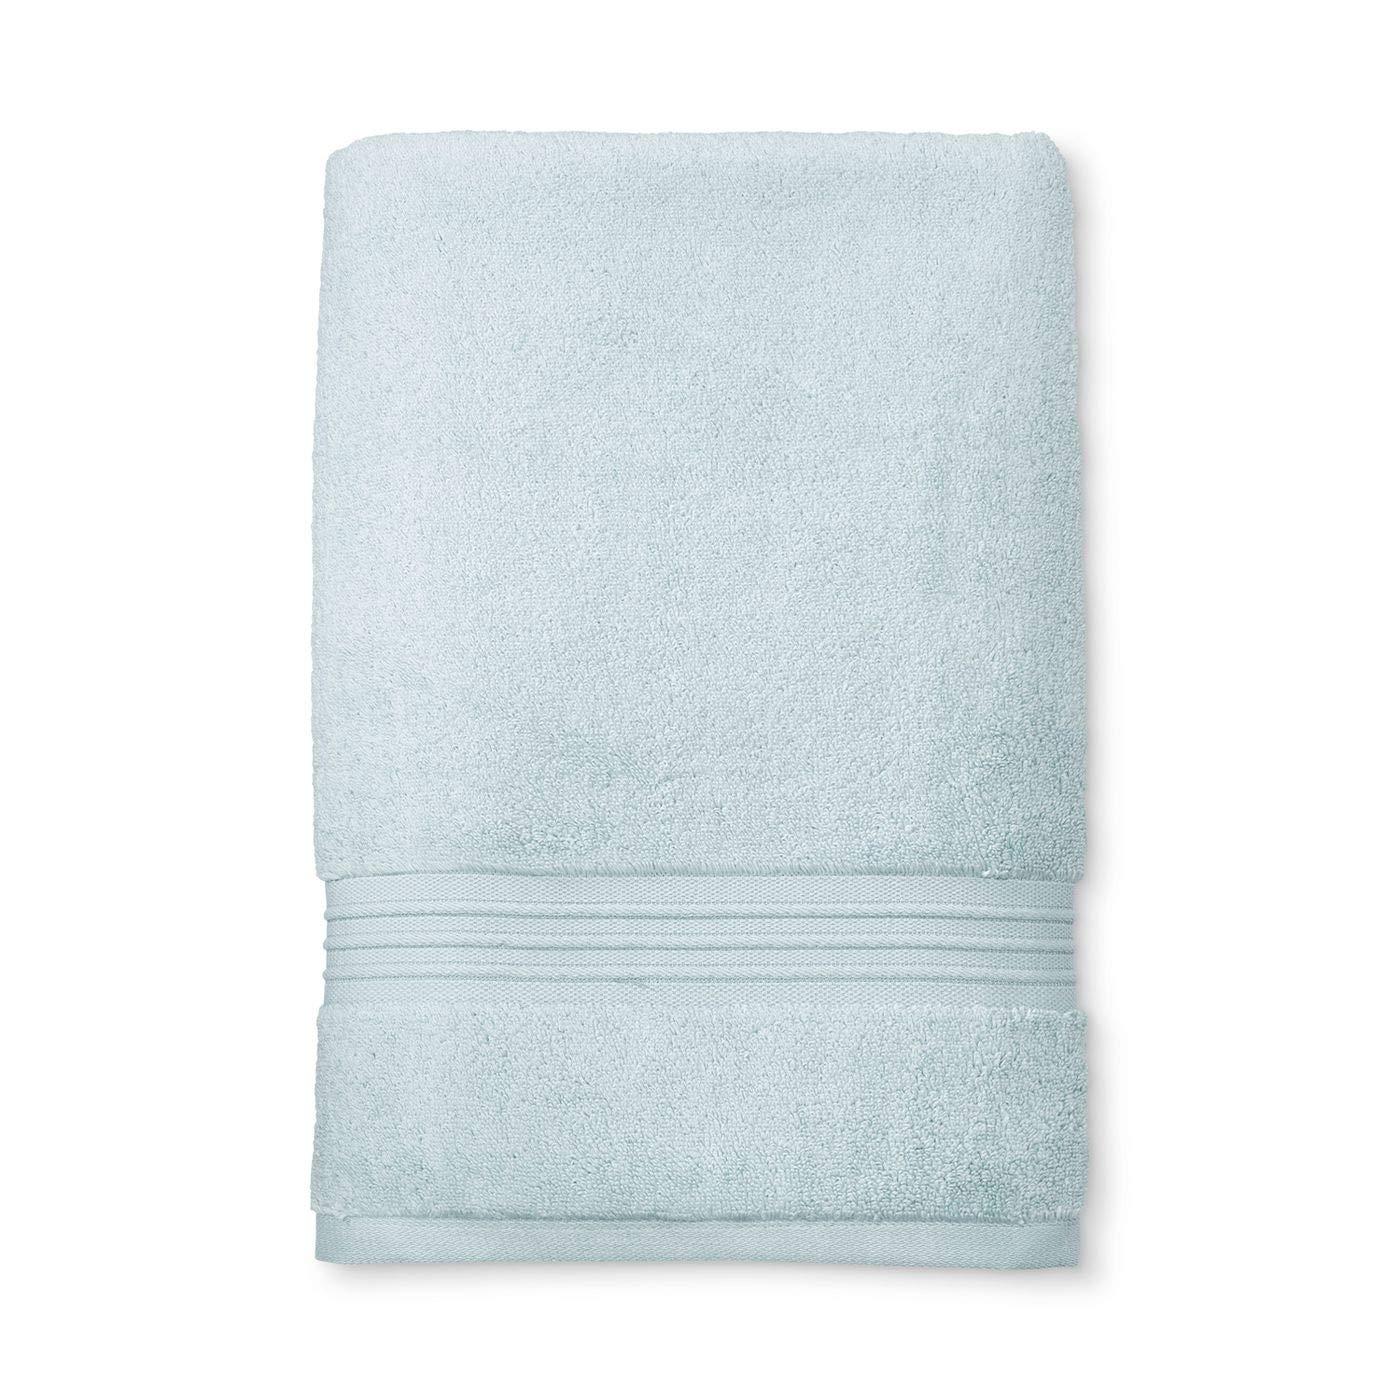 Fieldcrest Spa Bath Sheet (Newark Blue)